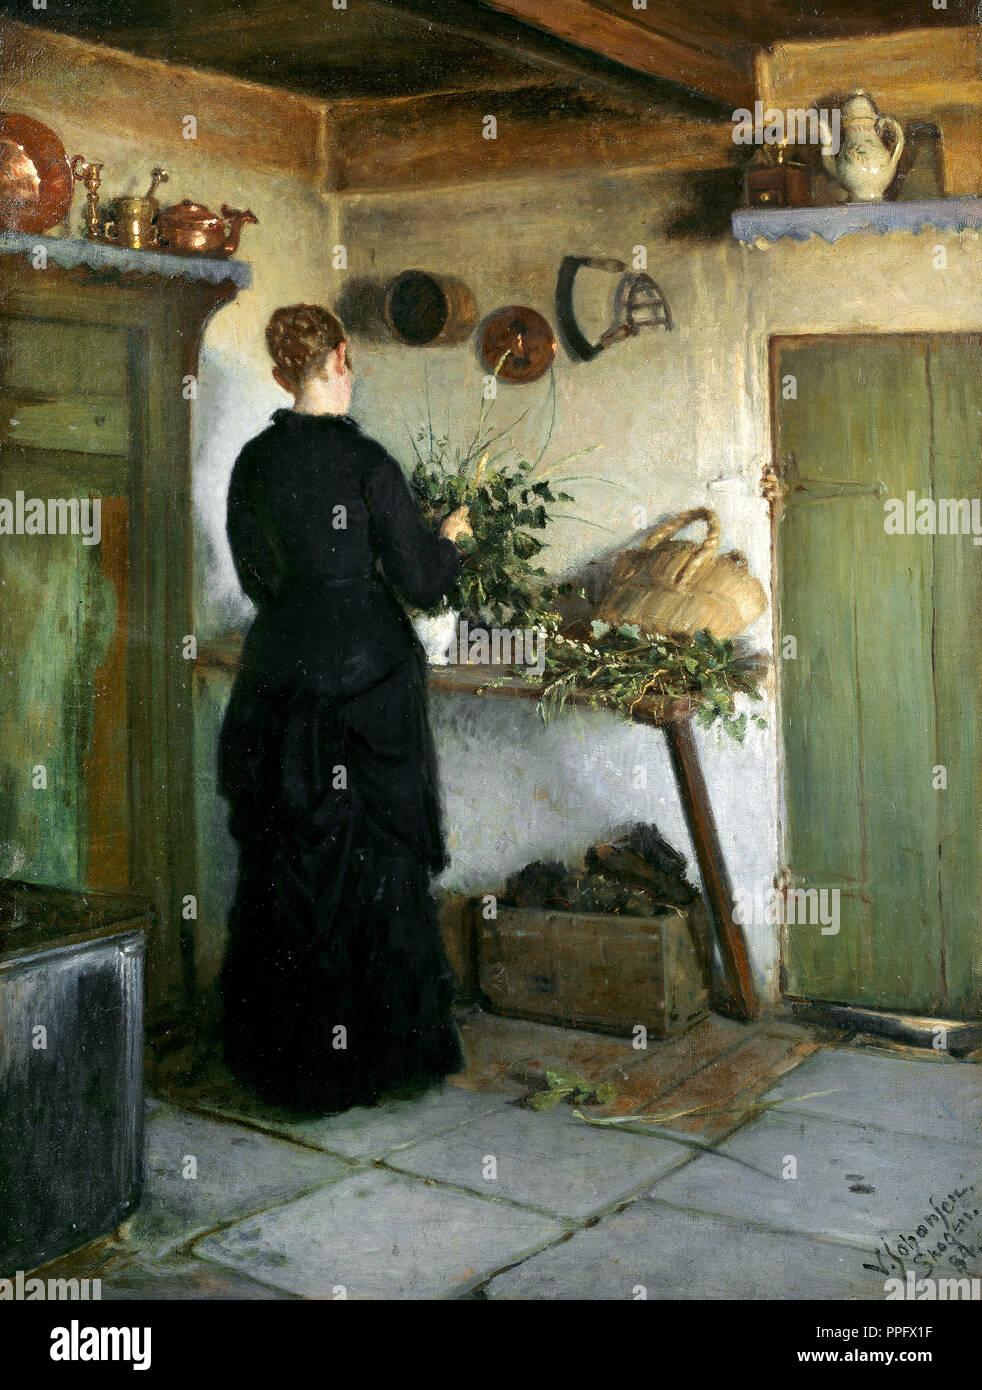 Viggo Johansen - Kitchen Interior. The Artist's Wife Arranging Flowers. 1884 Oil on canvas. Skagens Museum, Skagen, Denmark. - Stock Image